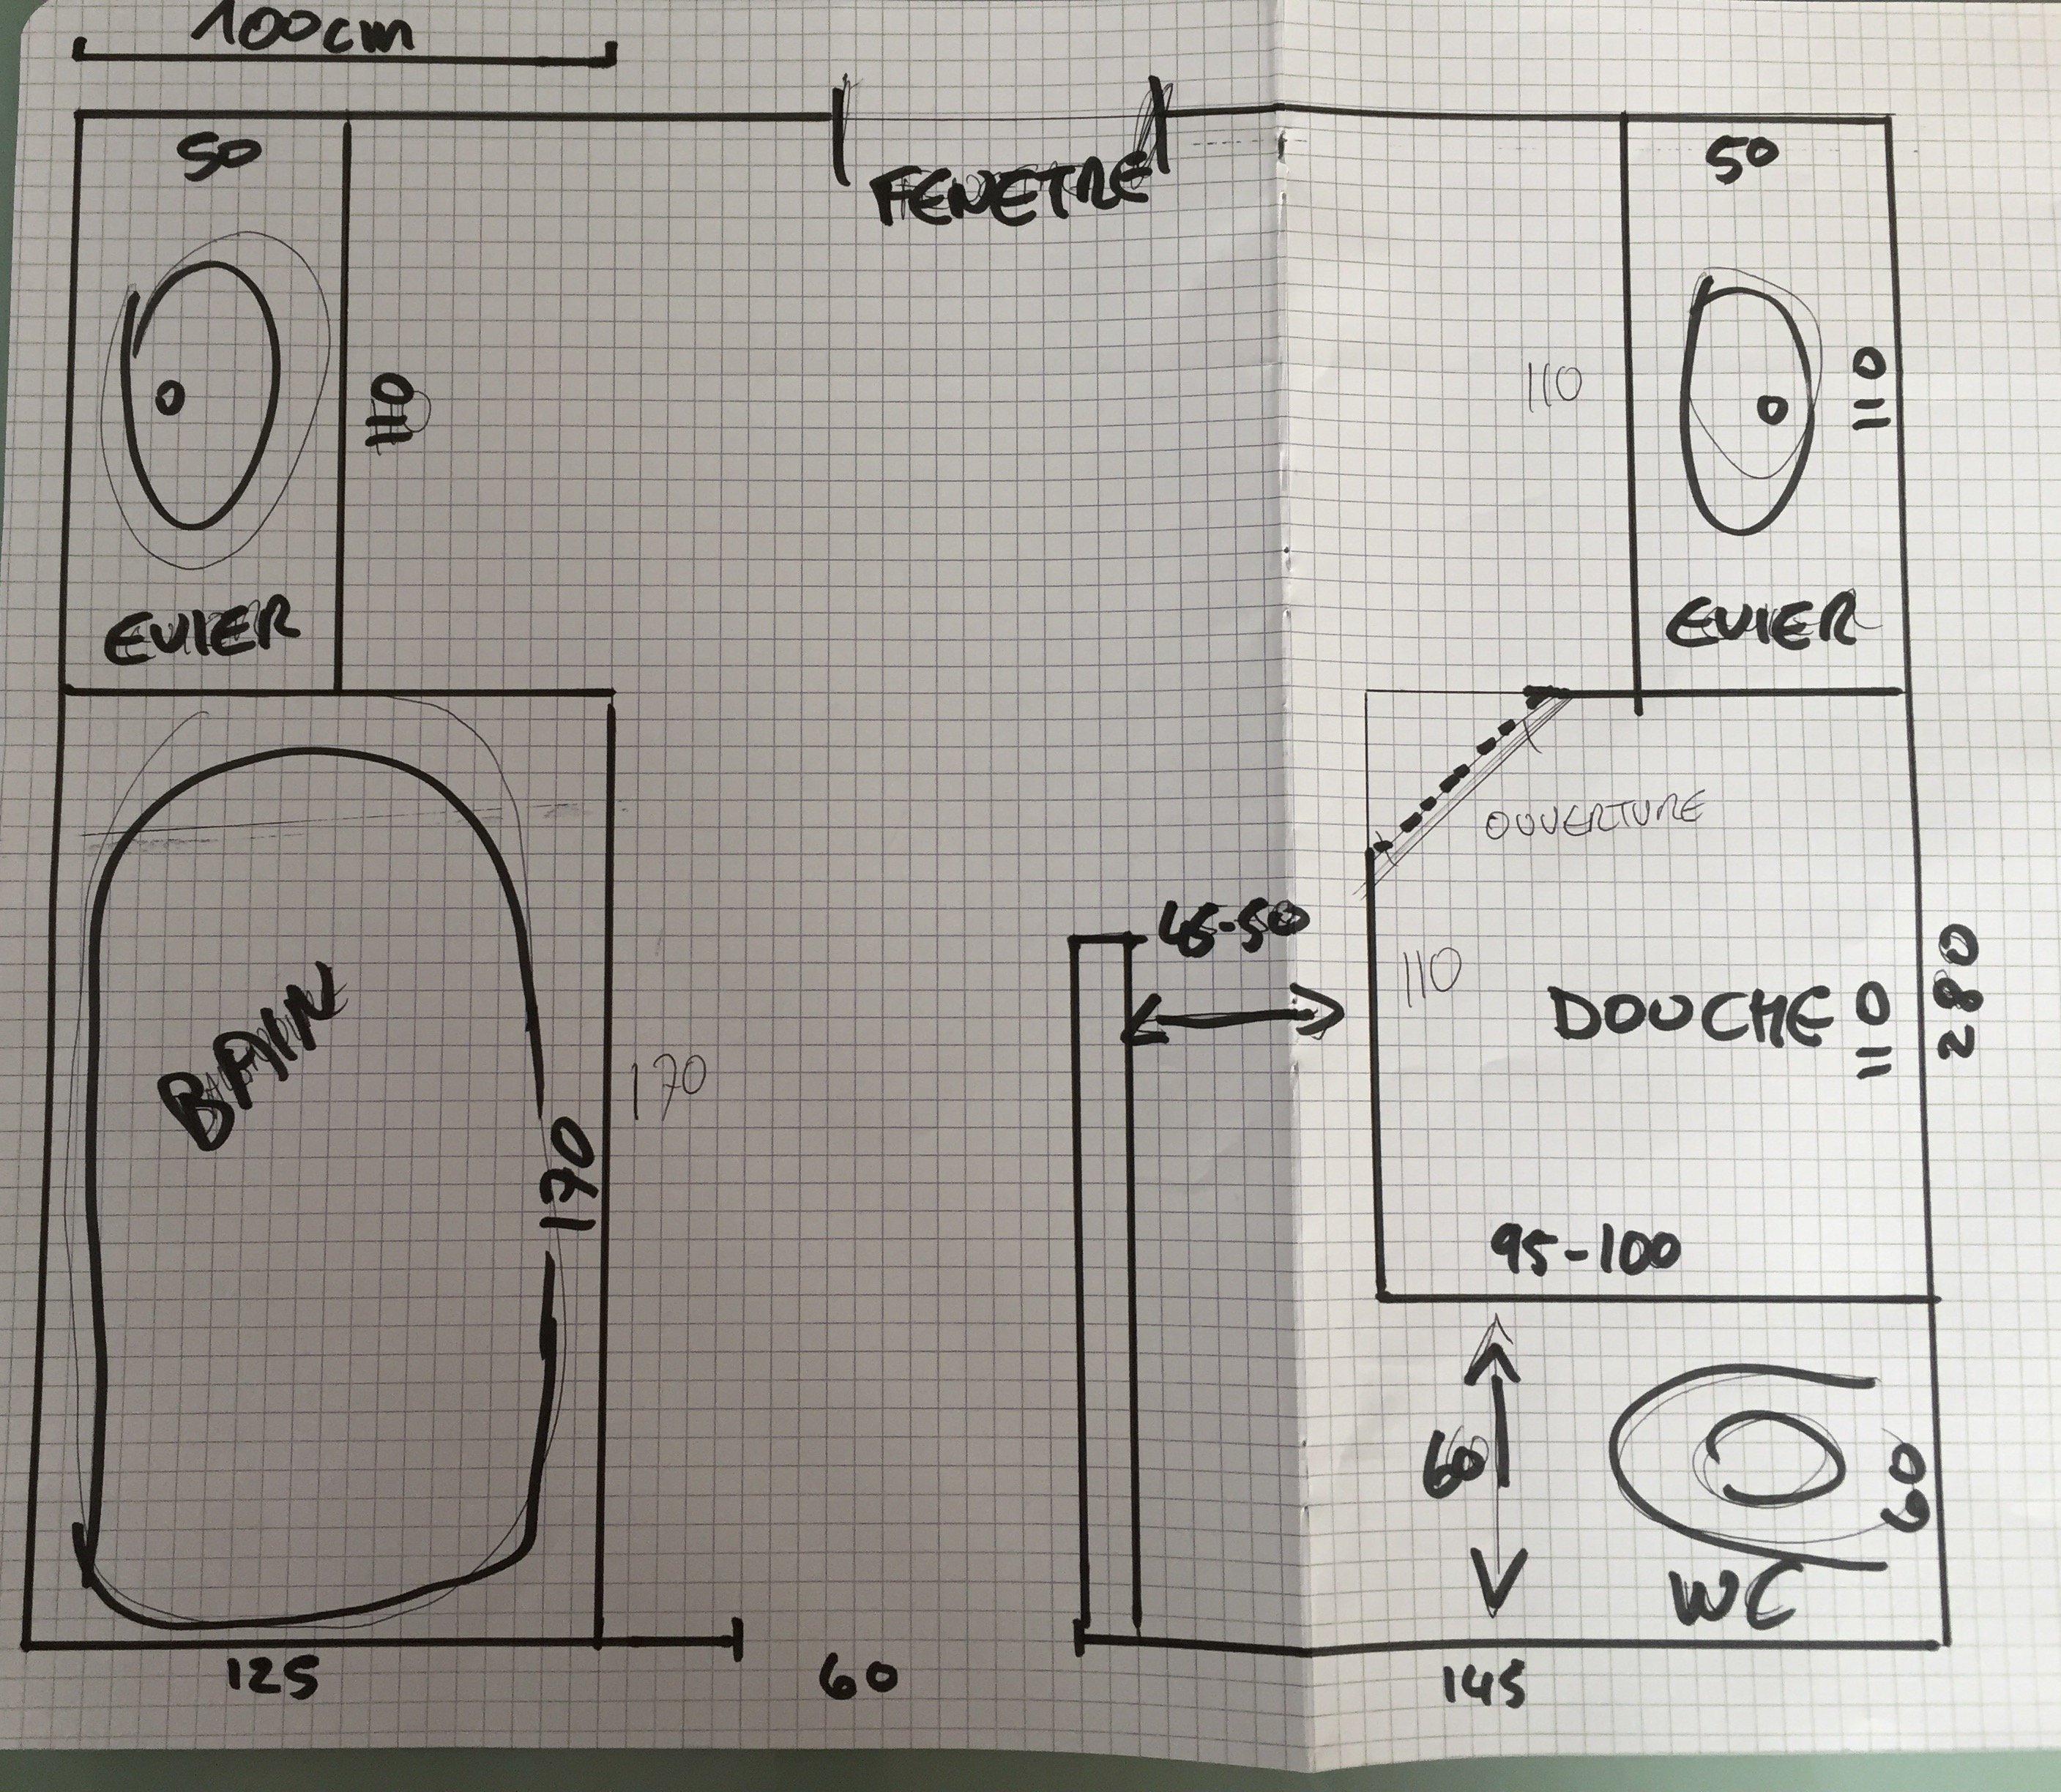 Httpsirpcdnmultiscreensitecomfbeafdmsr - Plan d une salle de bain